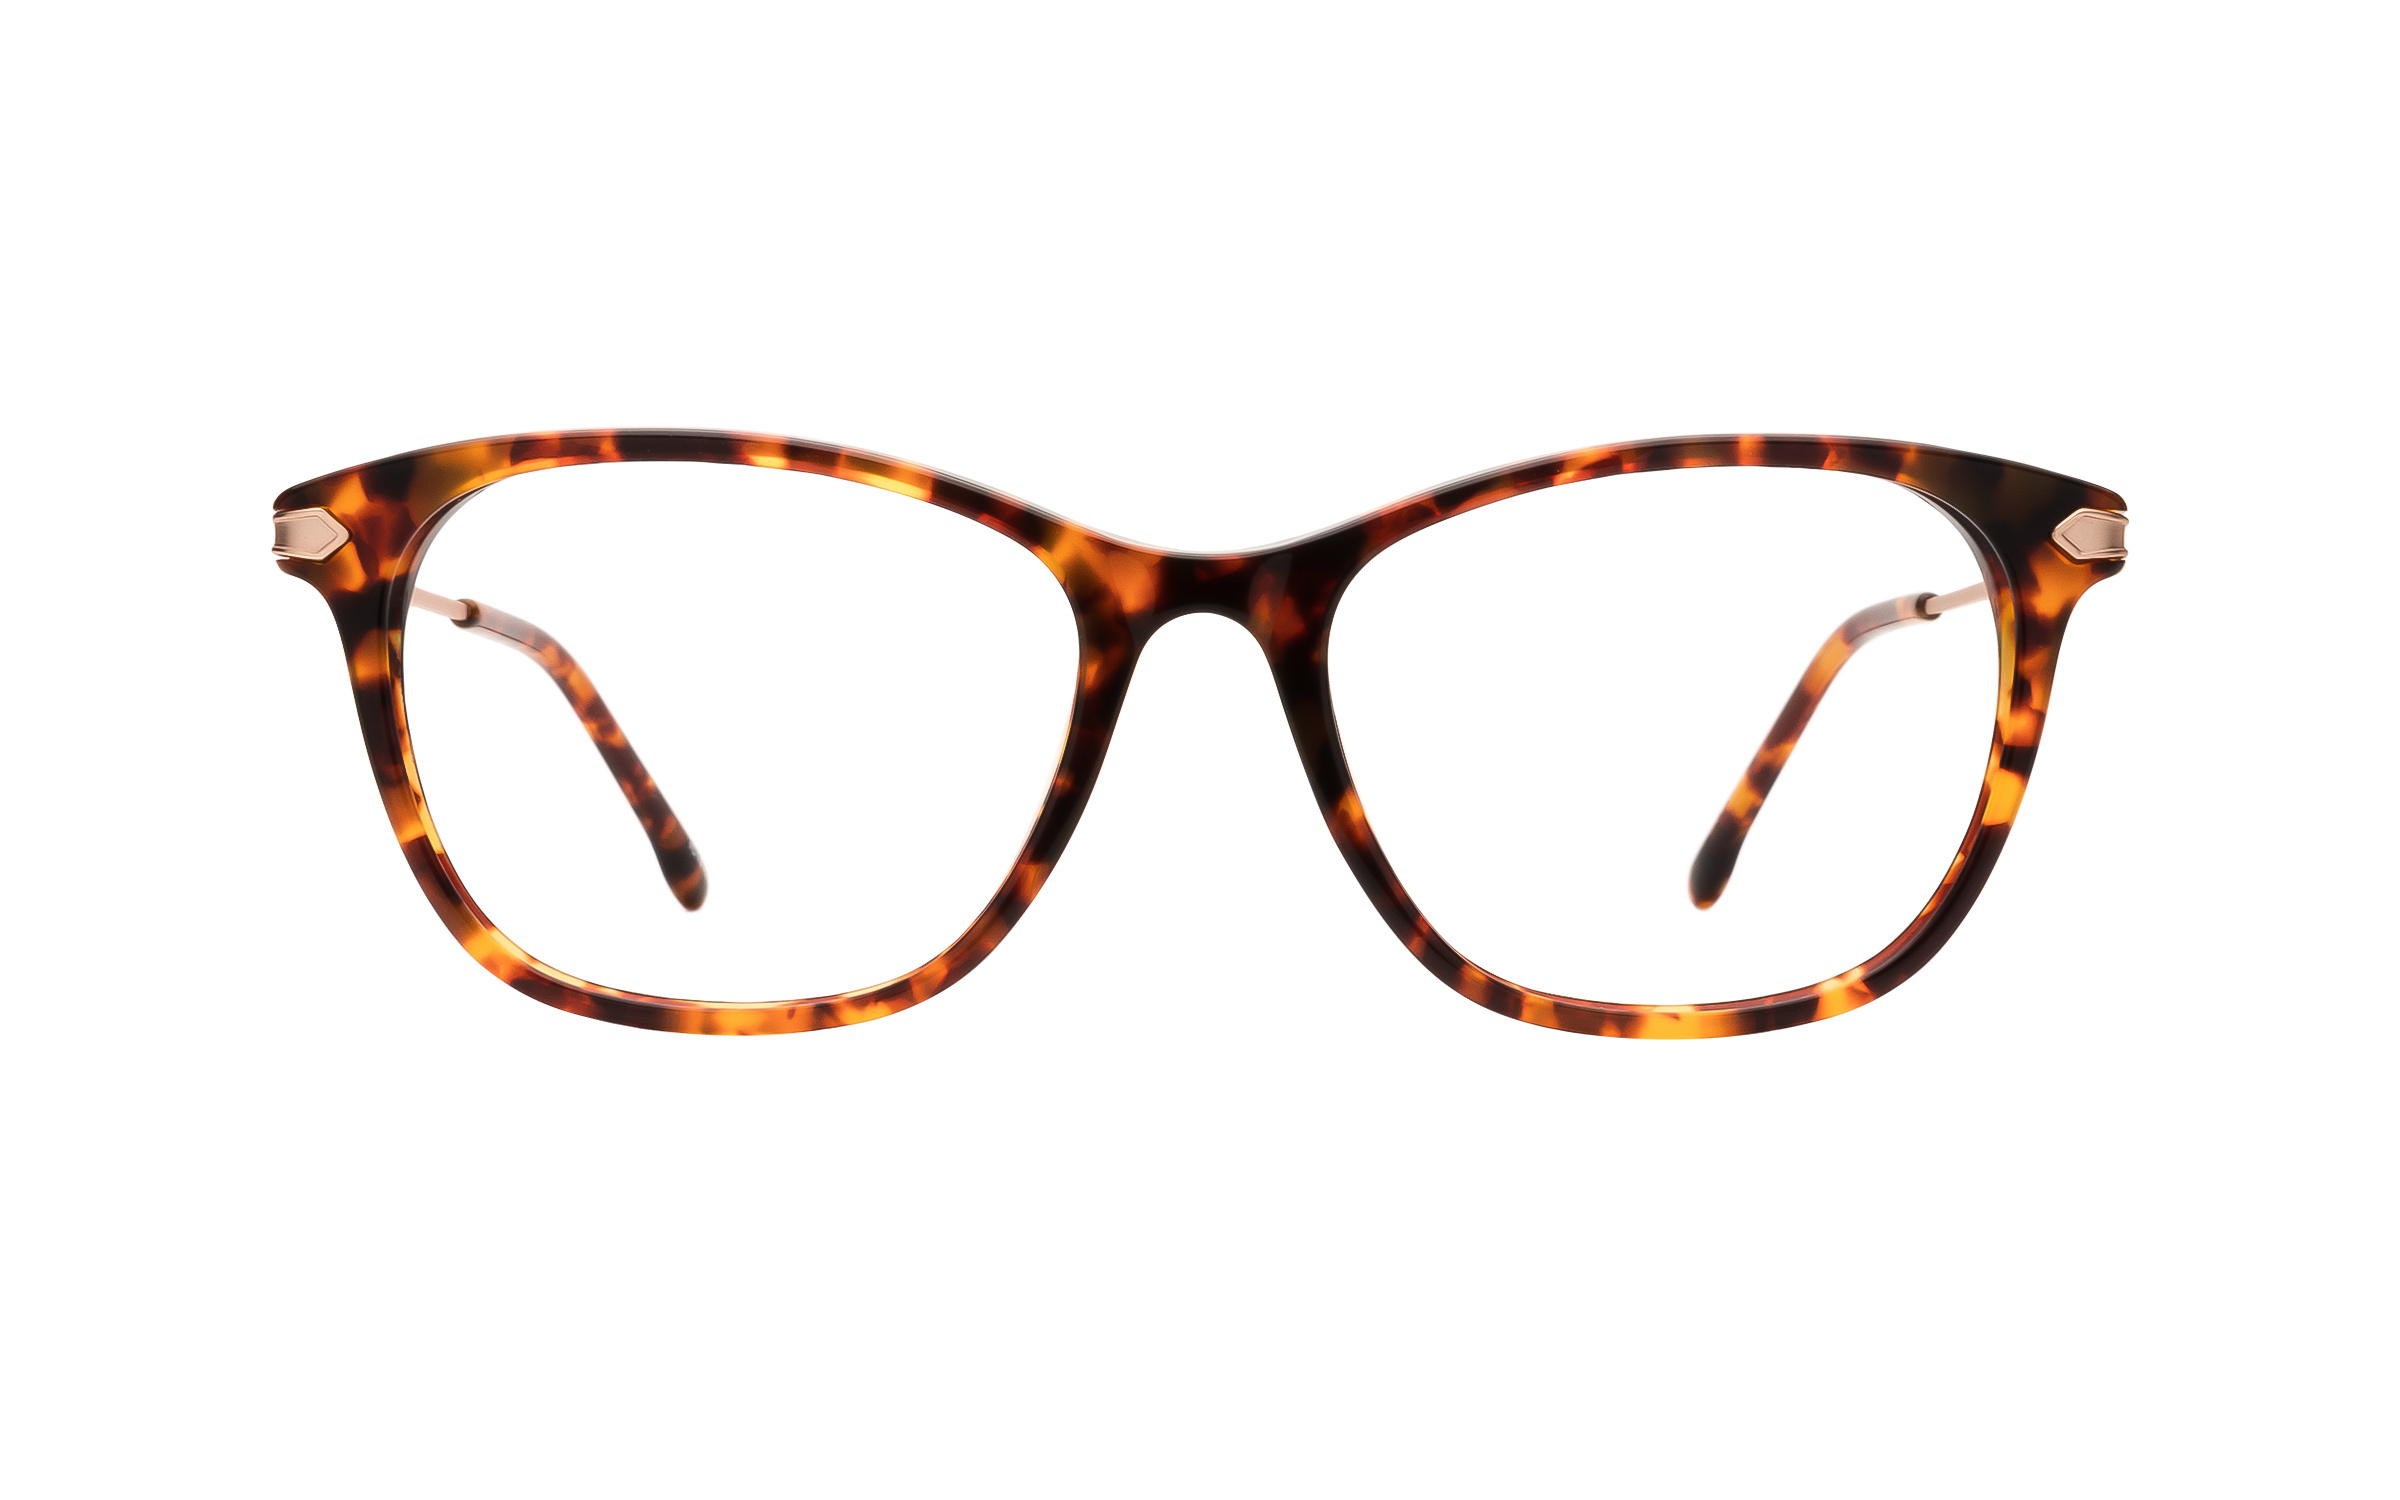 Derek_Cardigan_Womens_Glasses_DFrame_TortoiseBrown_AcetateMetal_Online_Coastal